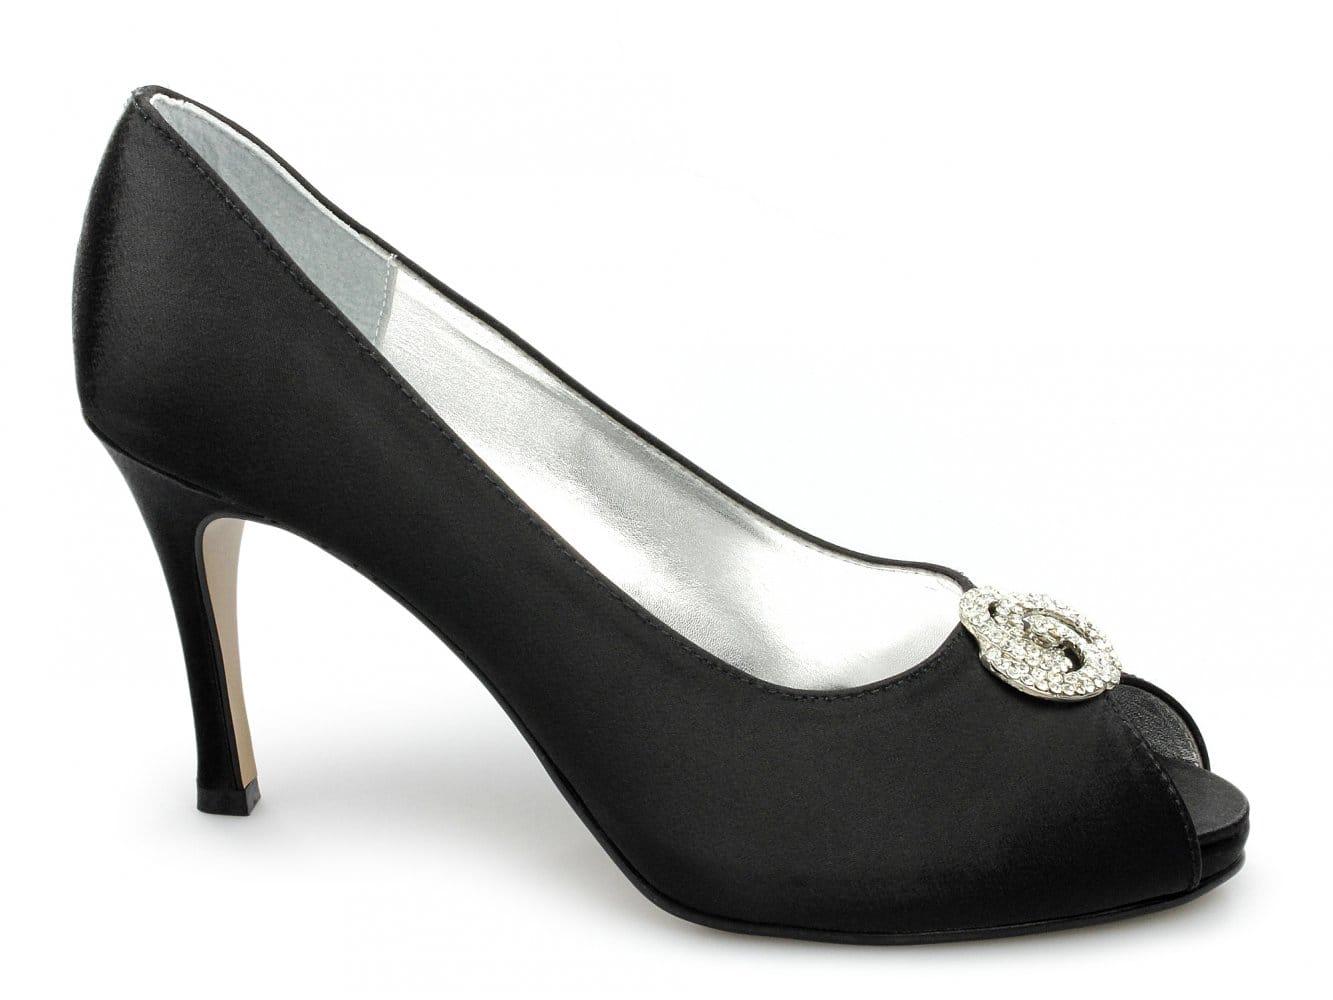 Silver Metallic Diamante Strappy Stiletto High Heels Twinxy